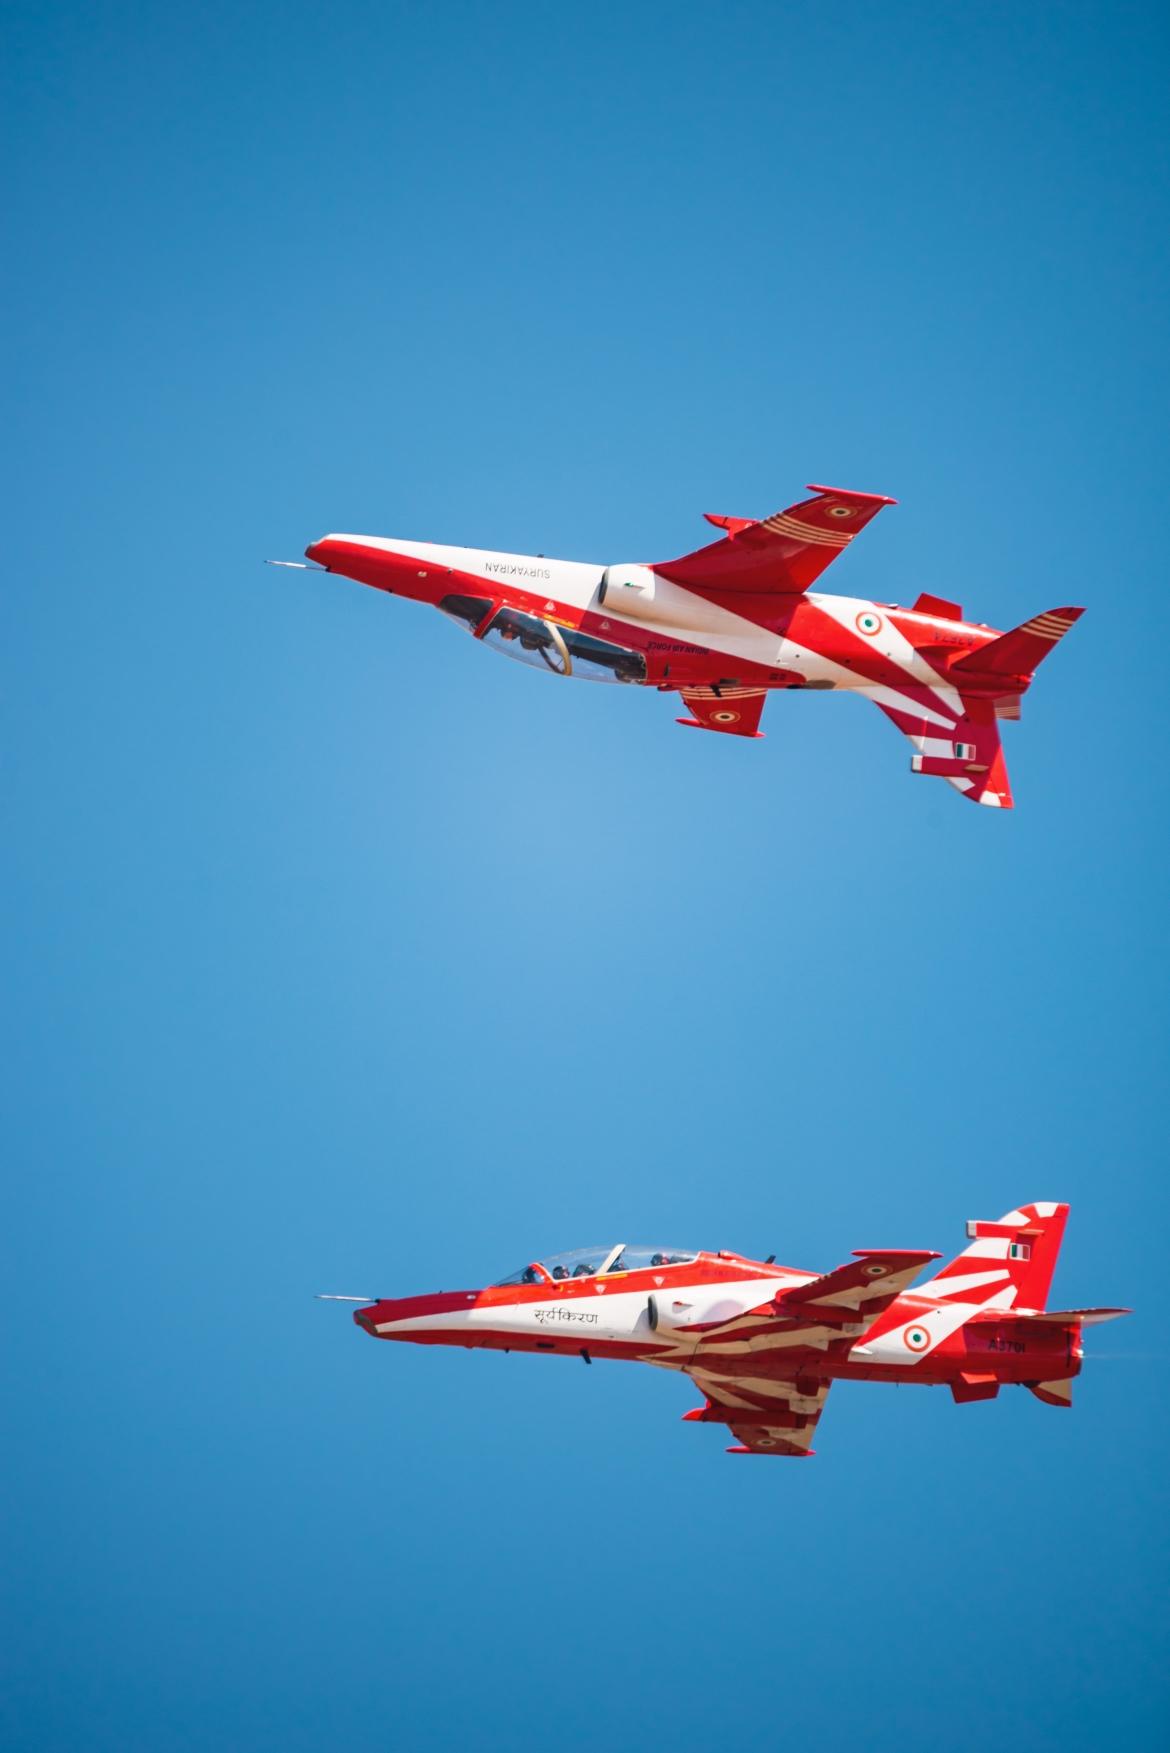 Stunts By Indian Air Force Surya Kiran Pilots